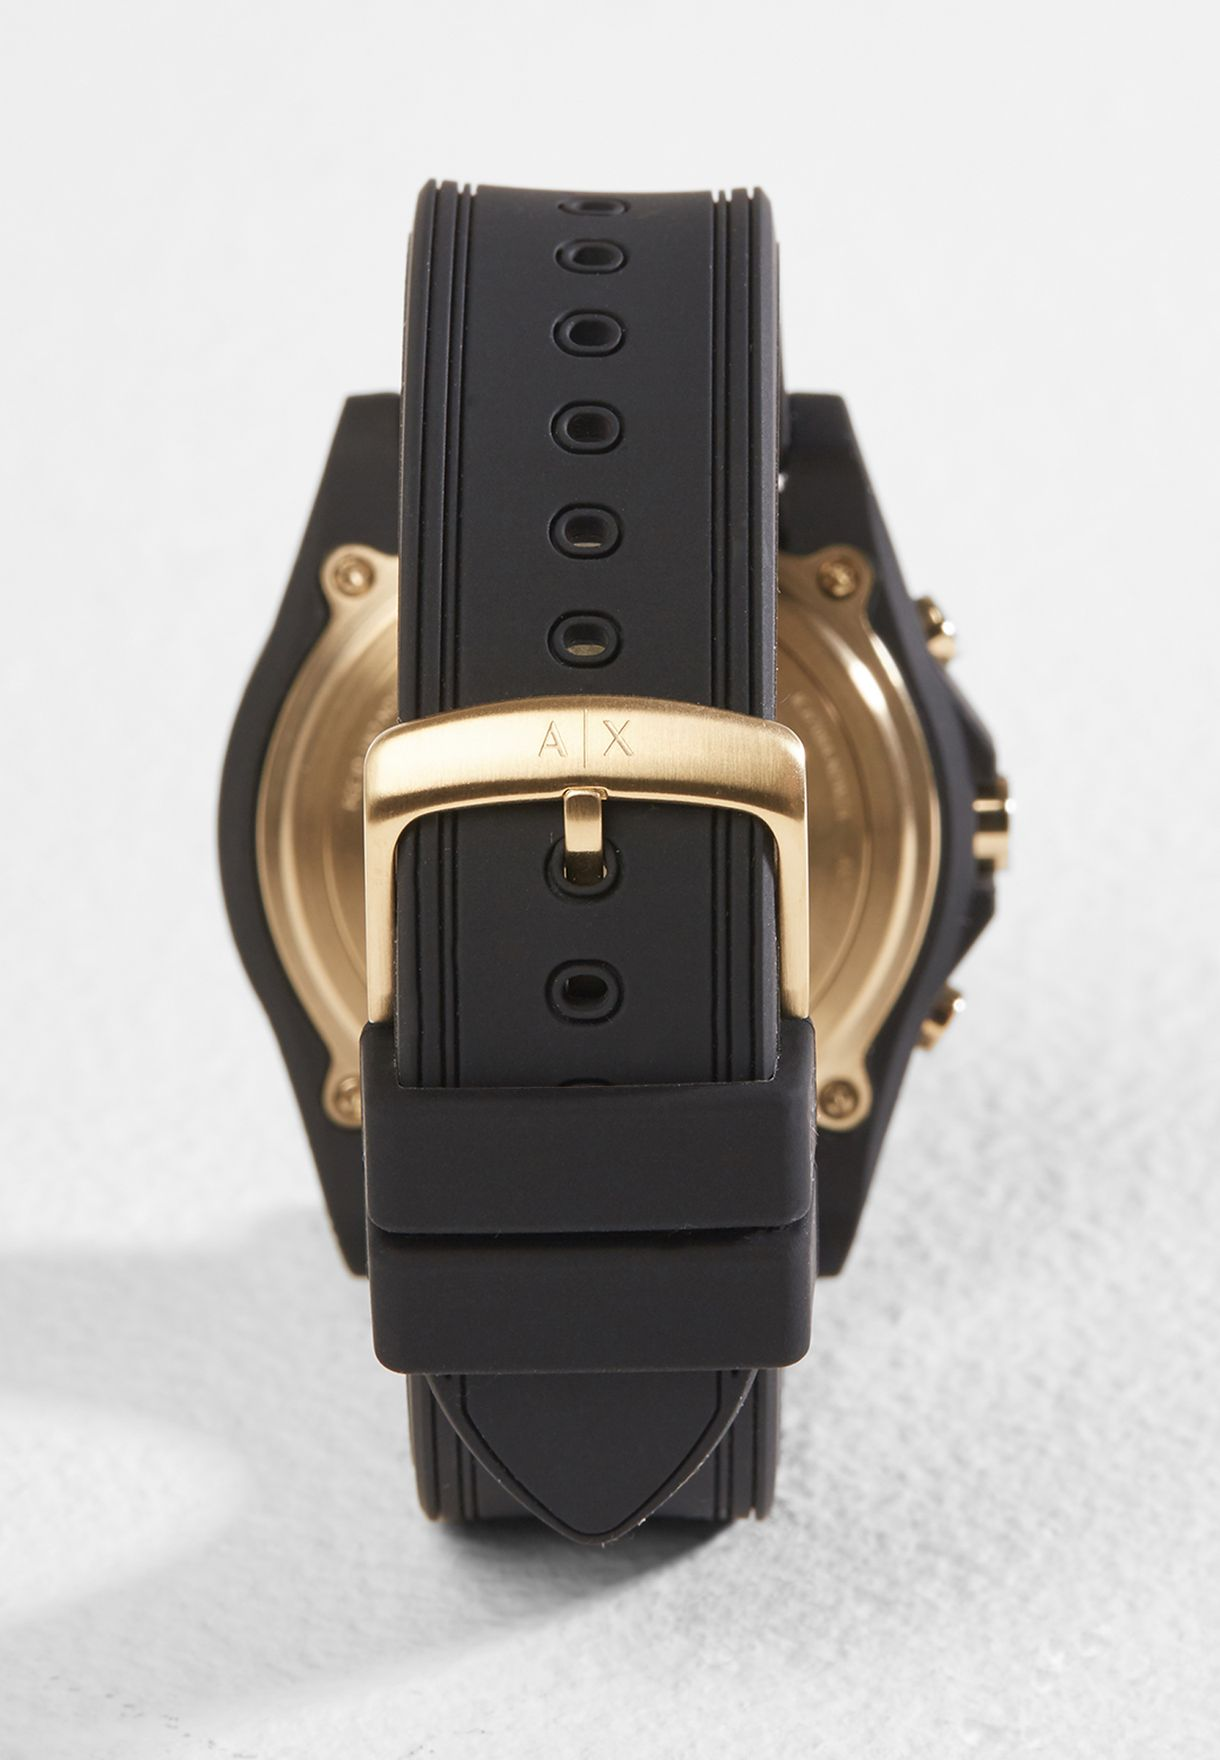 AX Connected Drexler Hybrid Smart Watch